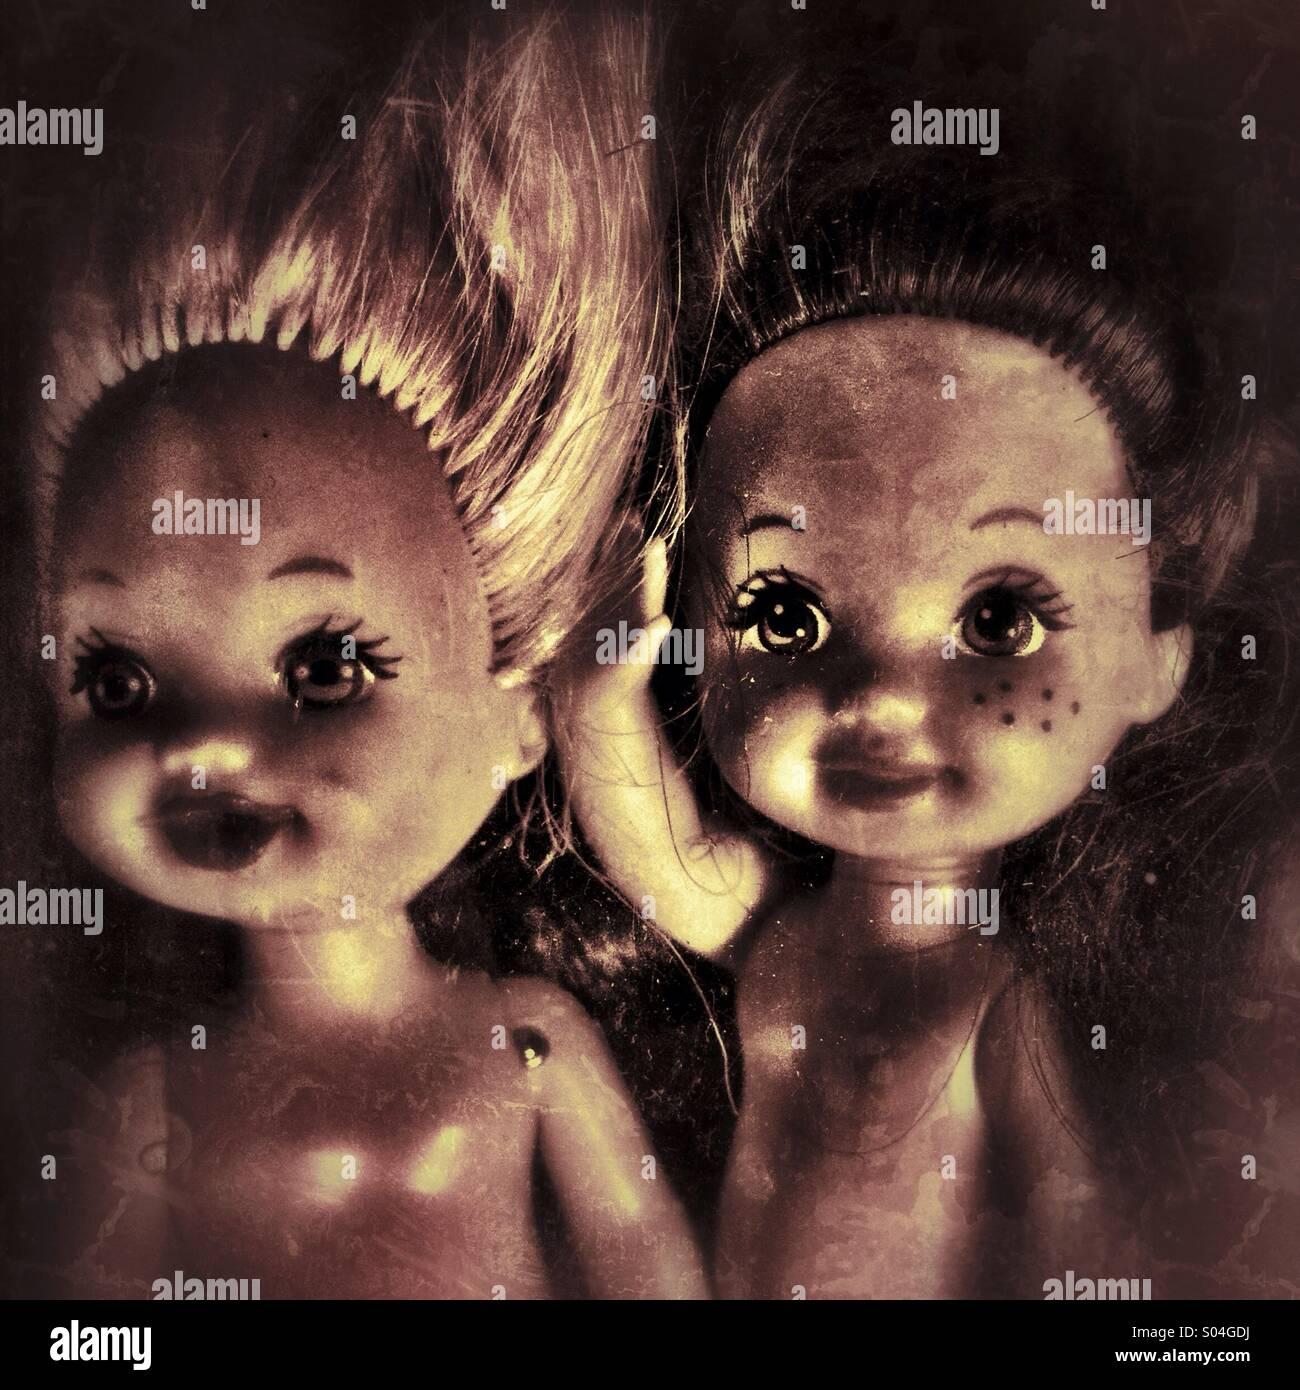 Gruselige Puppen